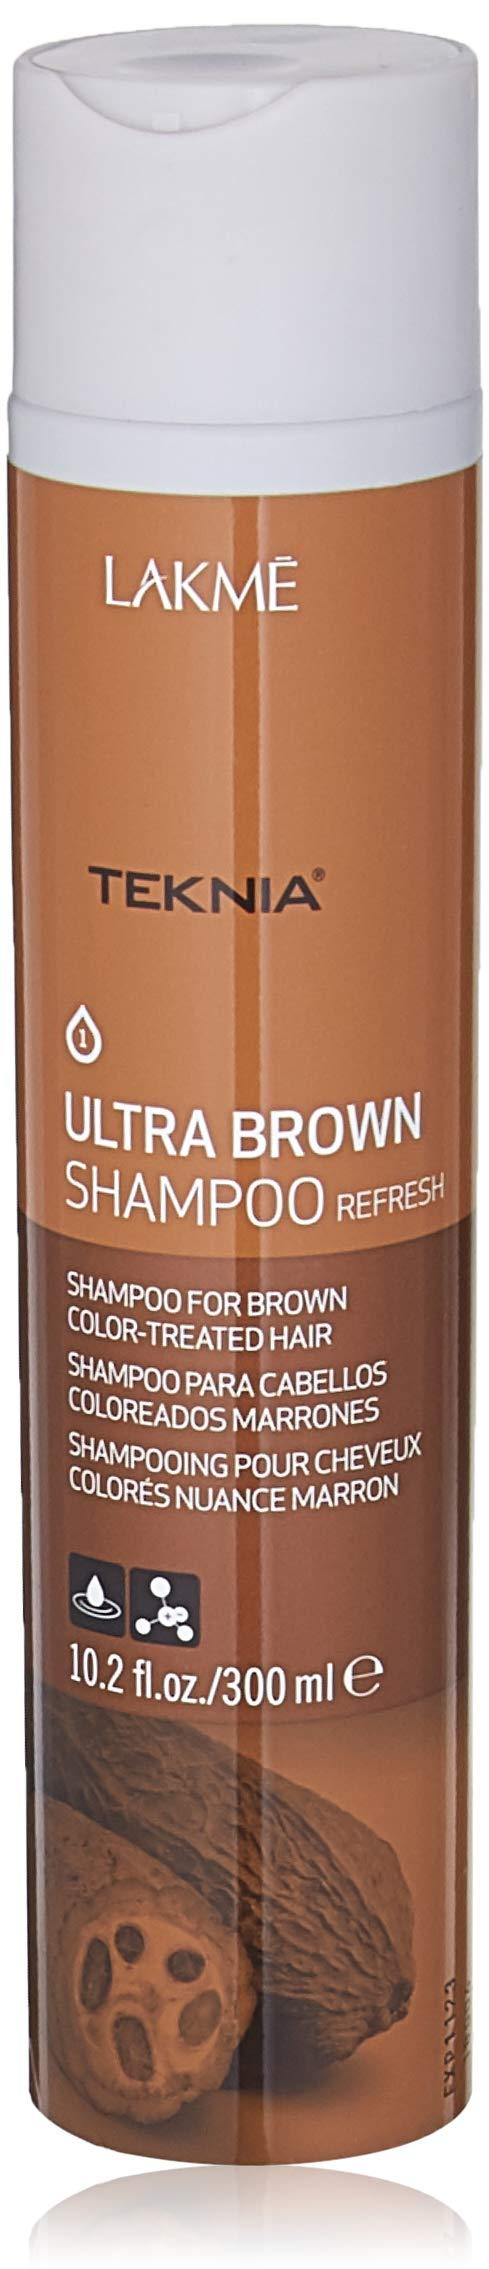 Lakme Teknia Ultra Brown Shampoo, 10.2 Fl Oz